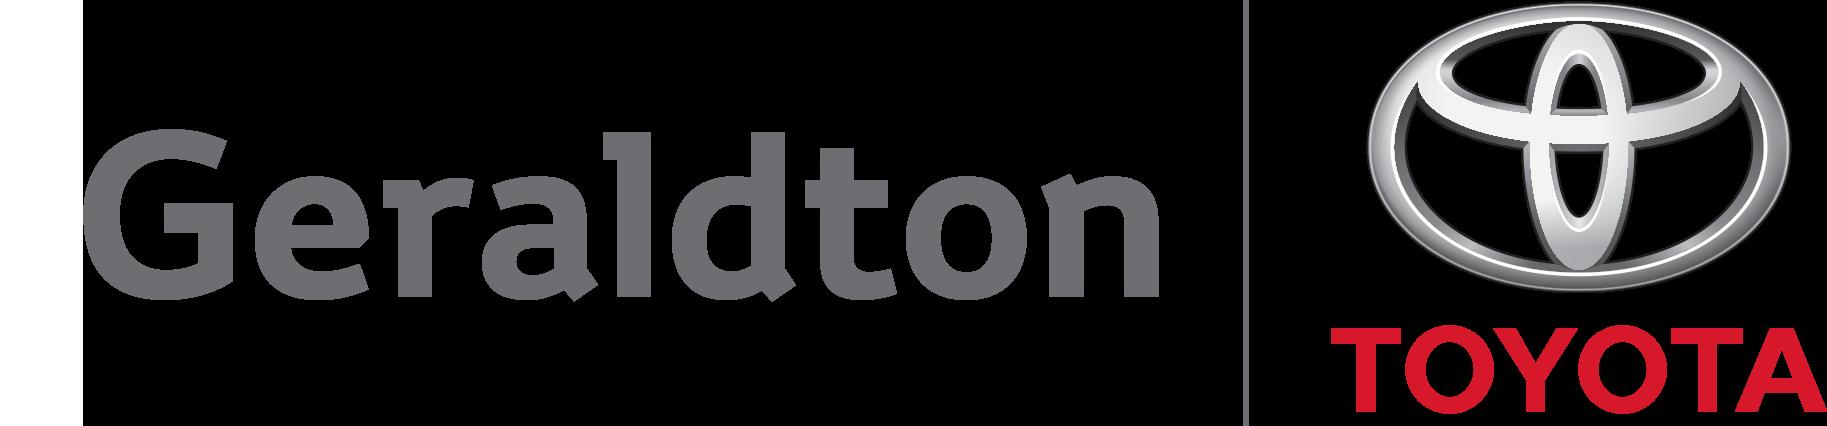 Geraldton_Toyota_copy